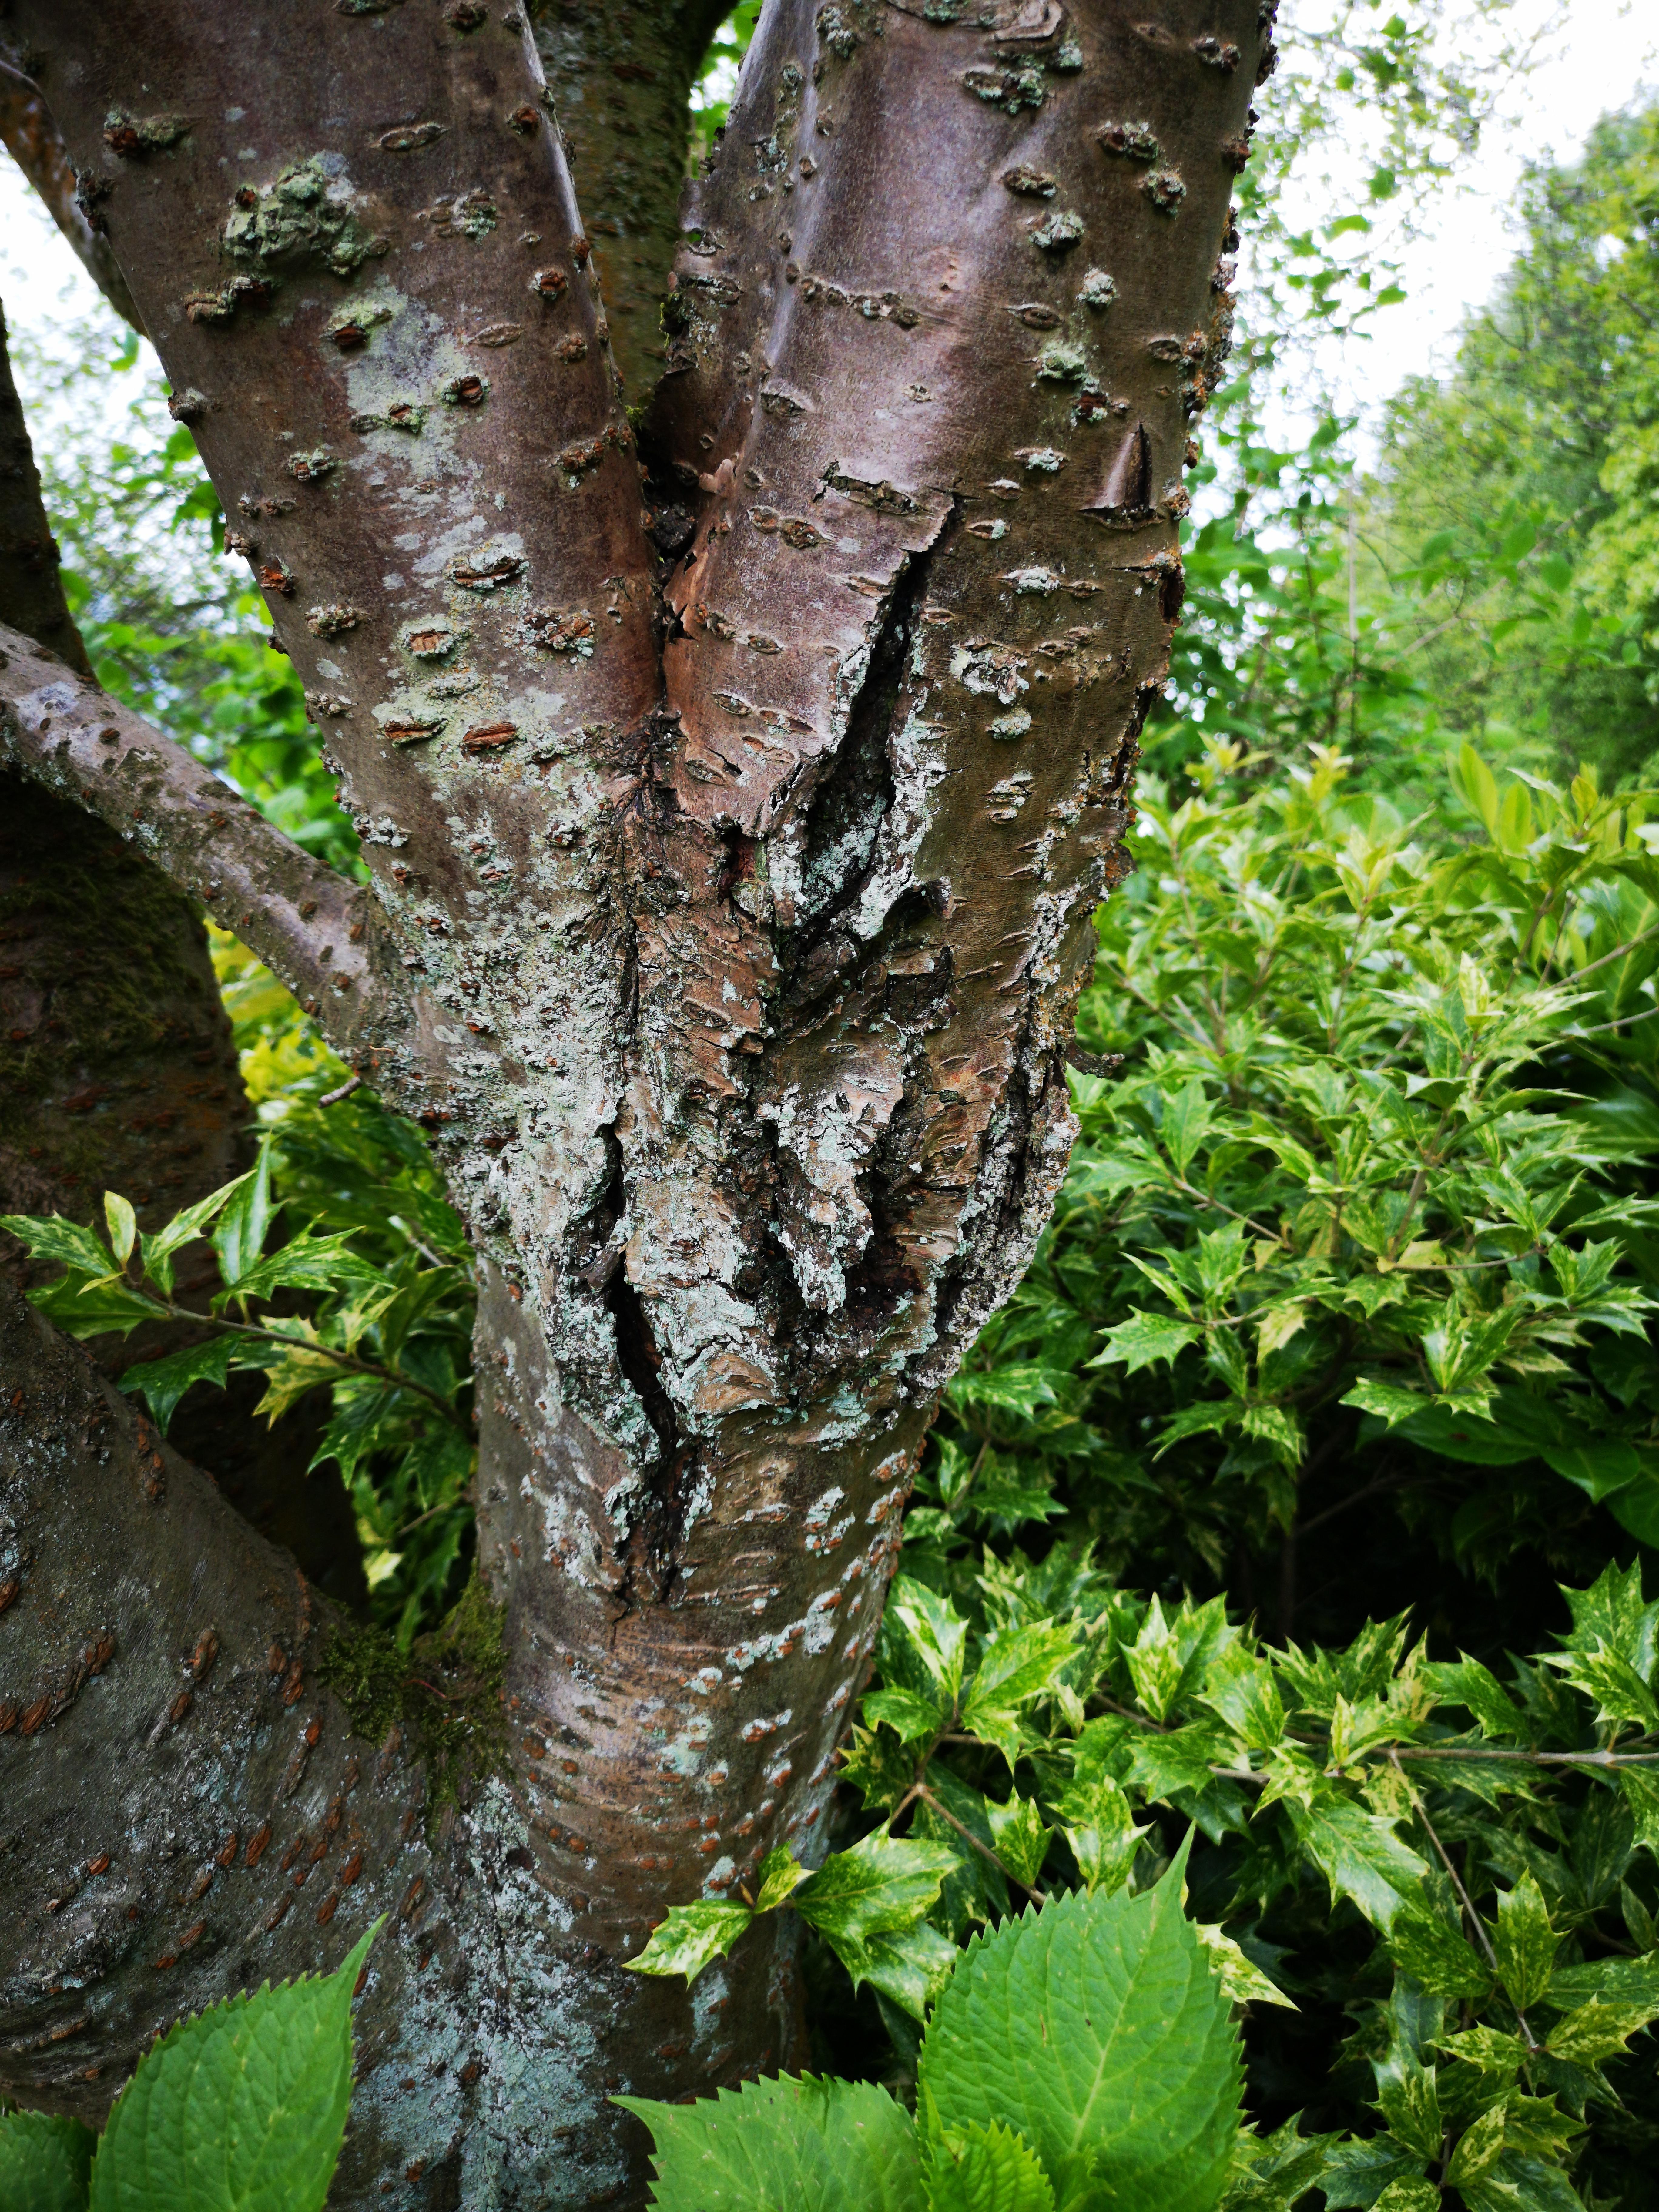 Cherry Tree Bark Split Very Little Blossom Fungi Pictures Arbtalk The Social Network For Arborists